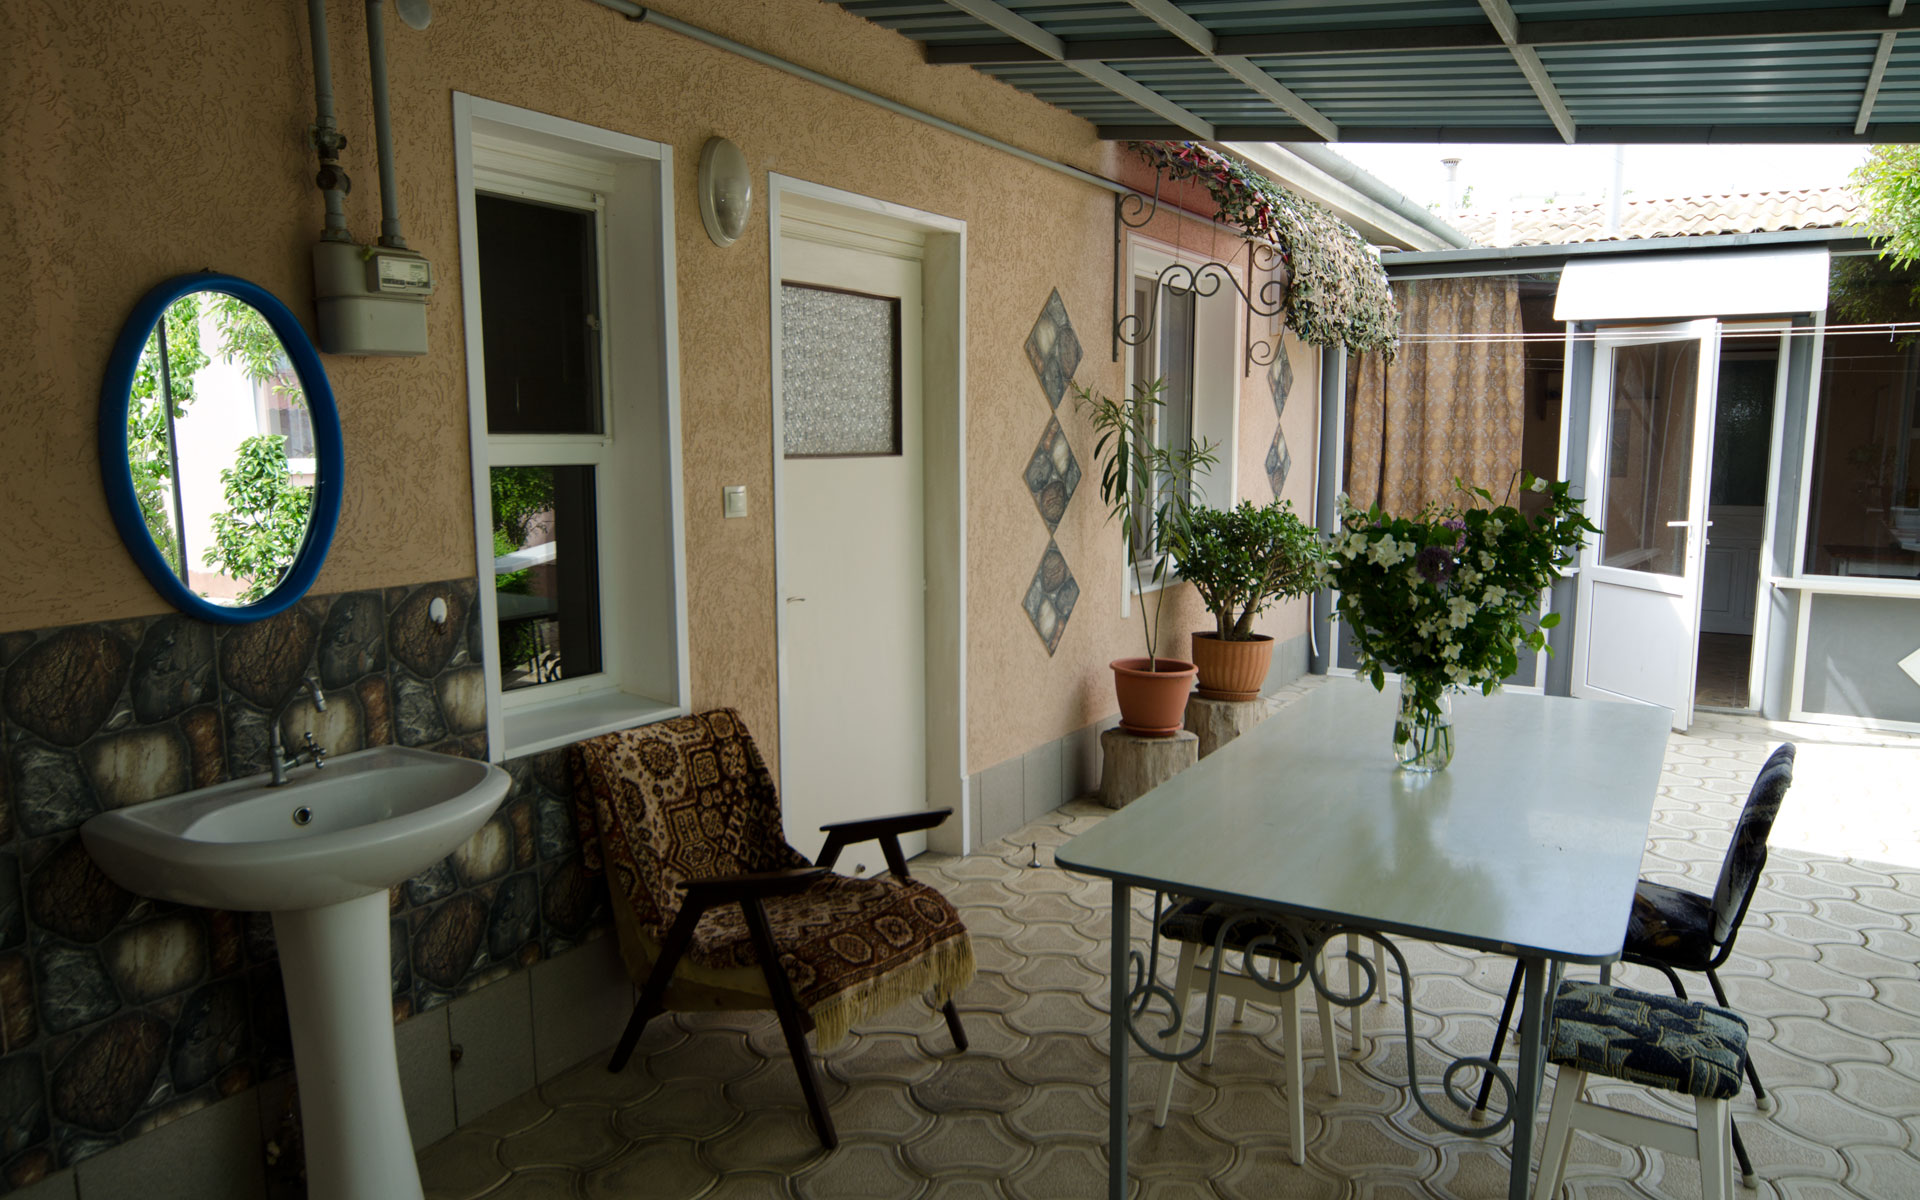 Беседка 1 номера. Квартира 1. 2 квартиры на ул. Гайдара. Заозёрное